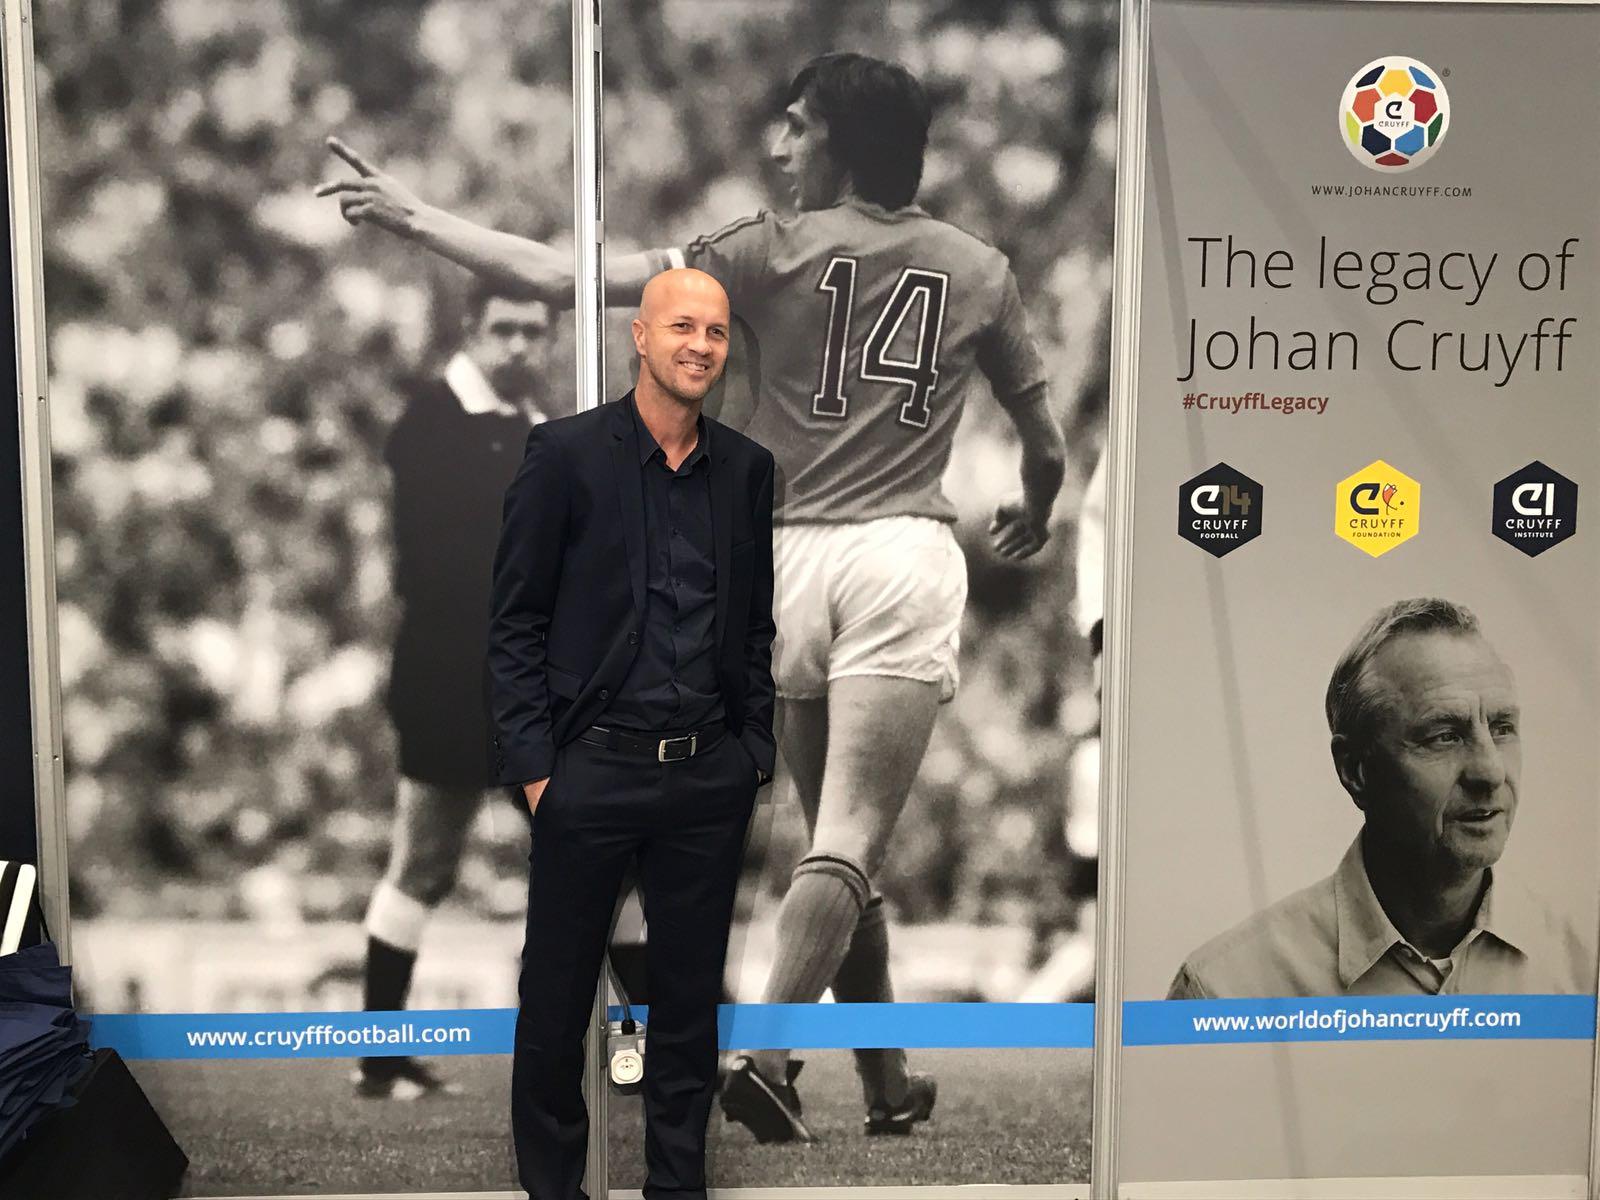 Jordi Cruyff presents father's footballing legacy at Soccerex